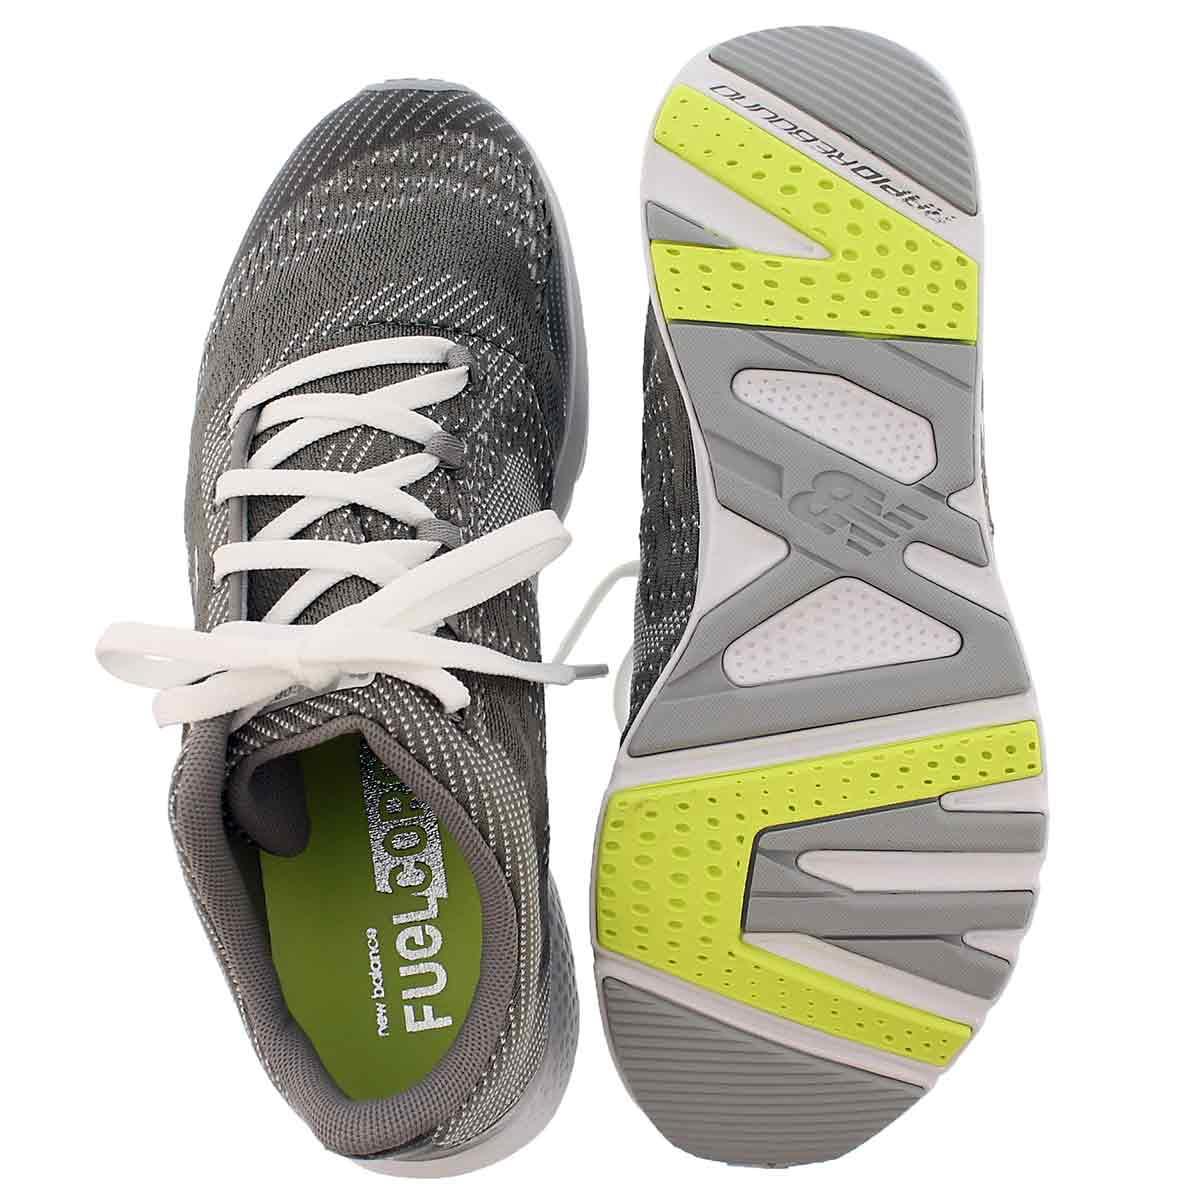 Lds Agility V2 slvr/wht lace up sneaker